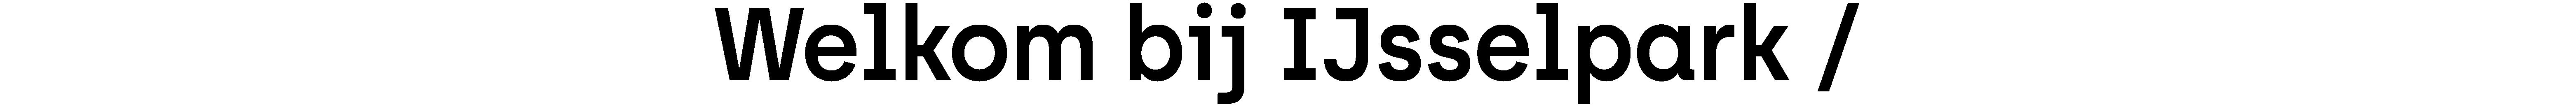 81d48430-406d-11eb-86e8-59f0c672e933.png